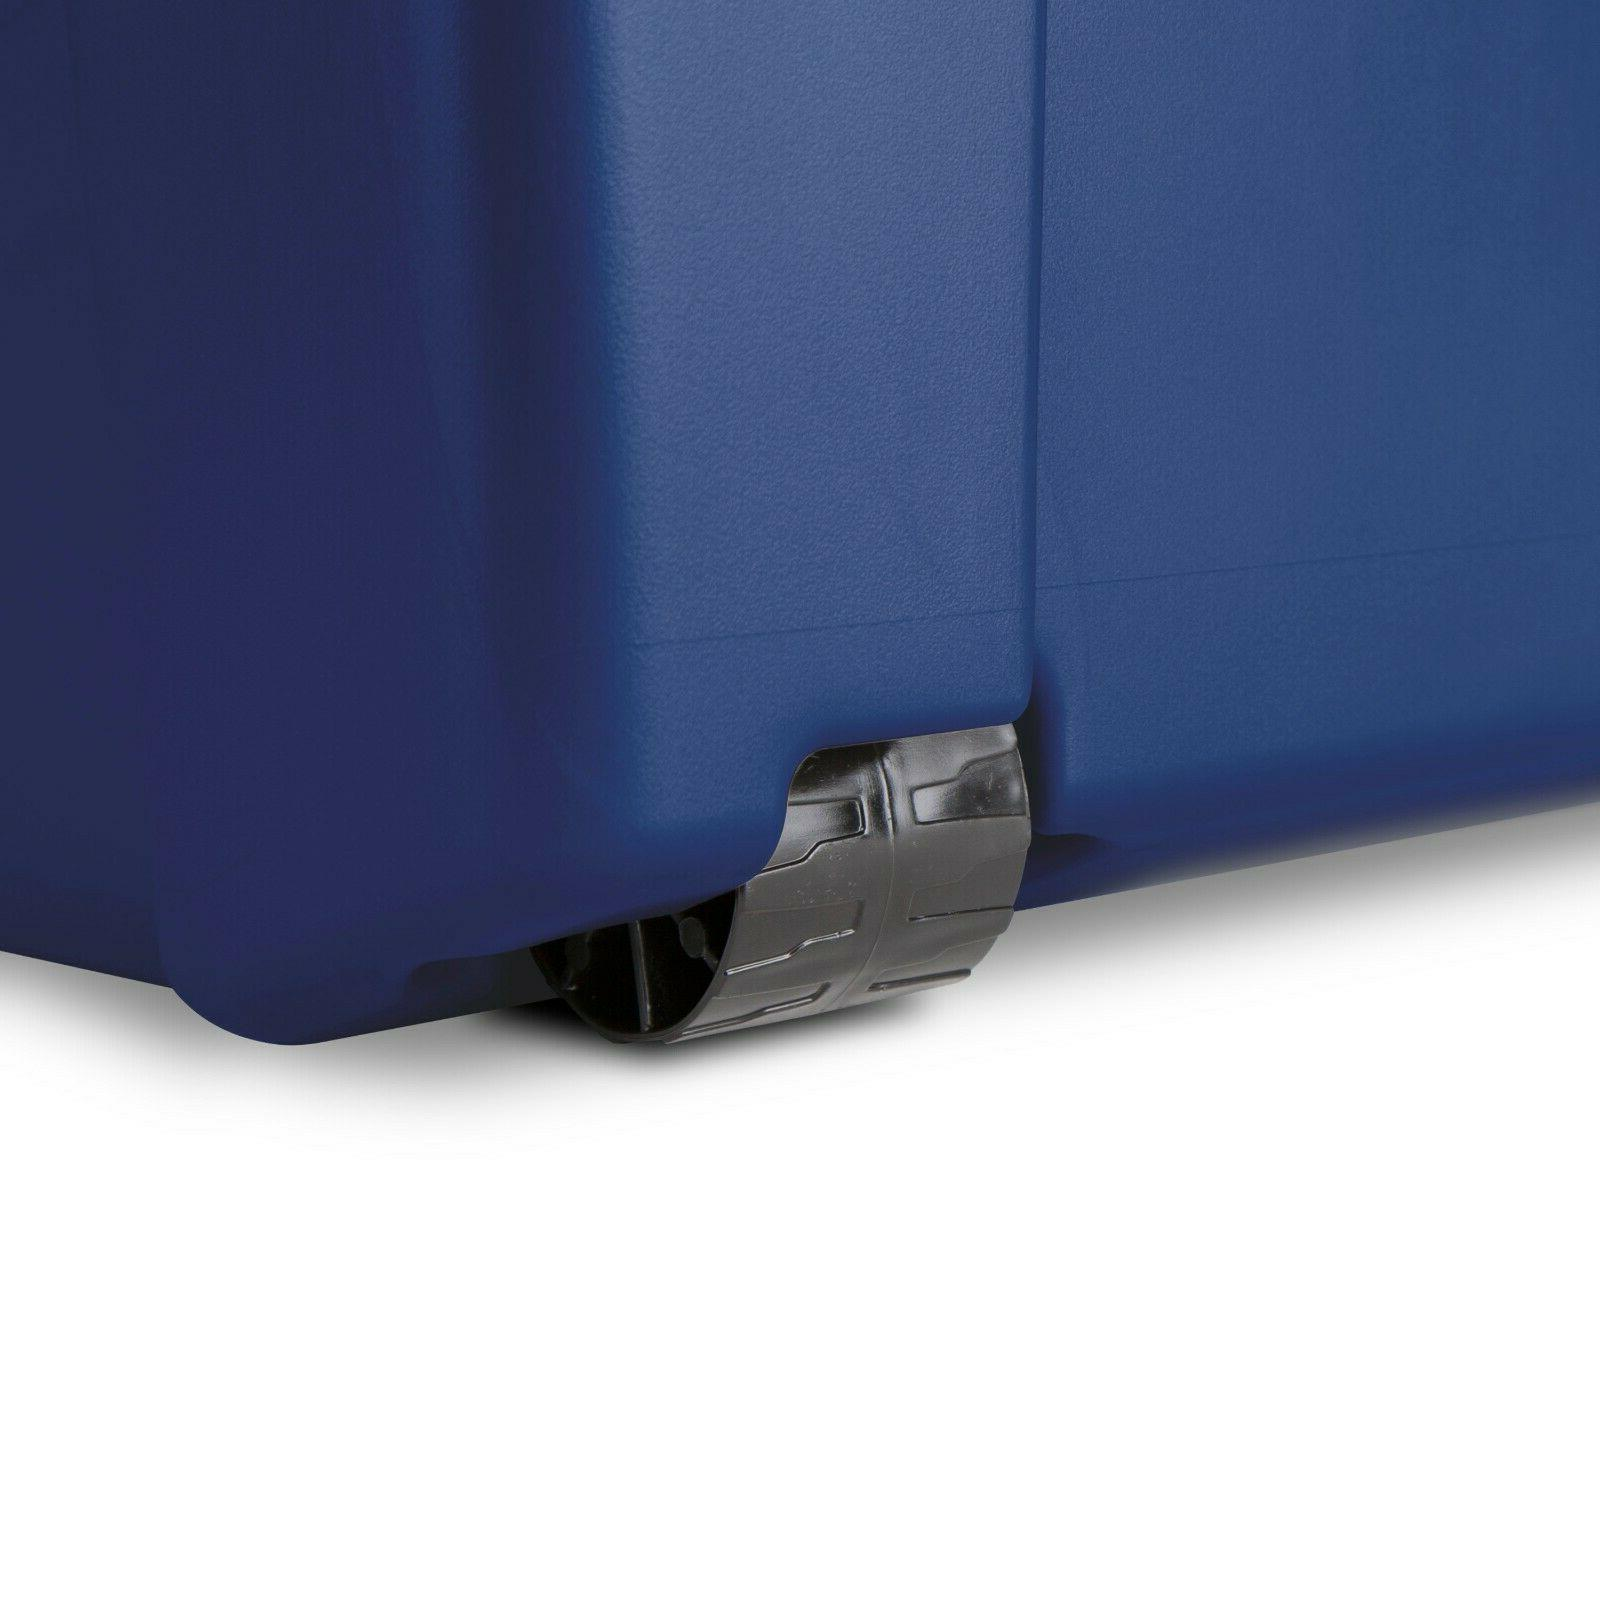 2 PACK Foot Locker Trunk Storage Footlocker Organizer W/ NEW